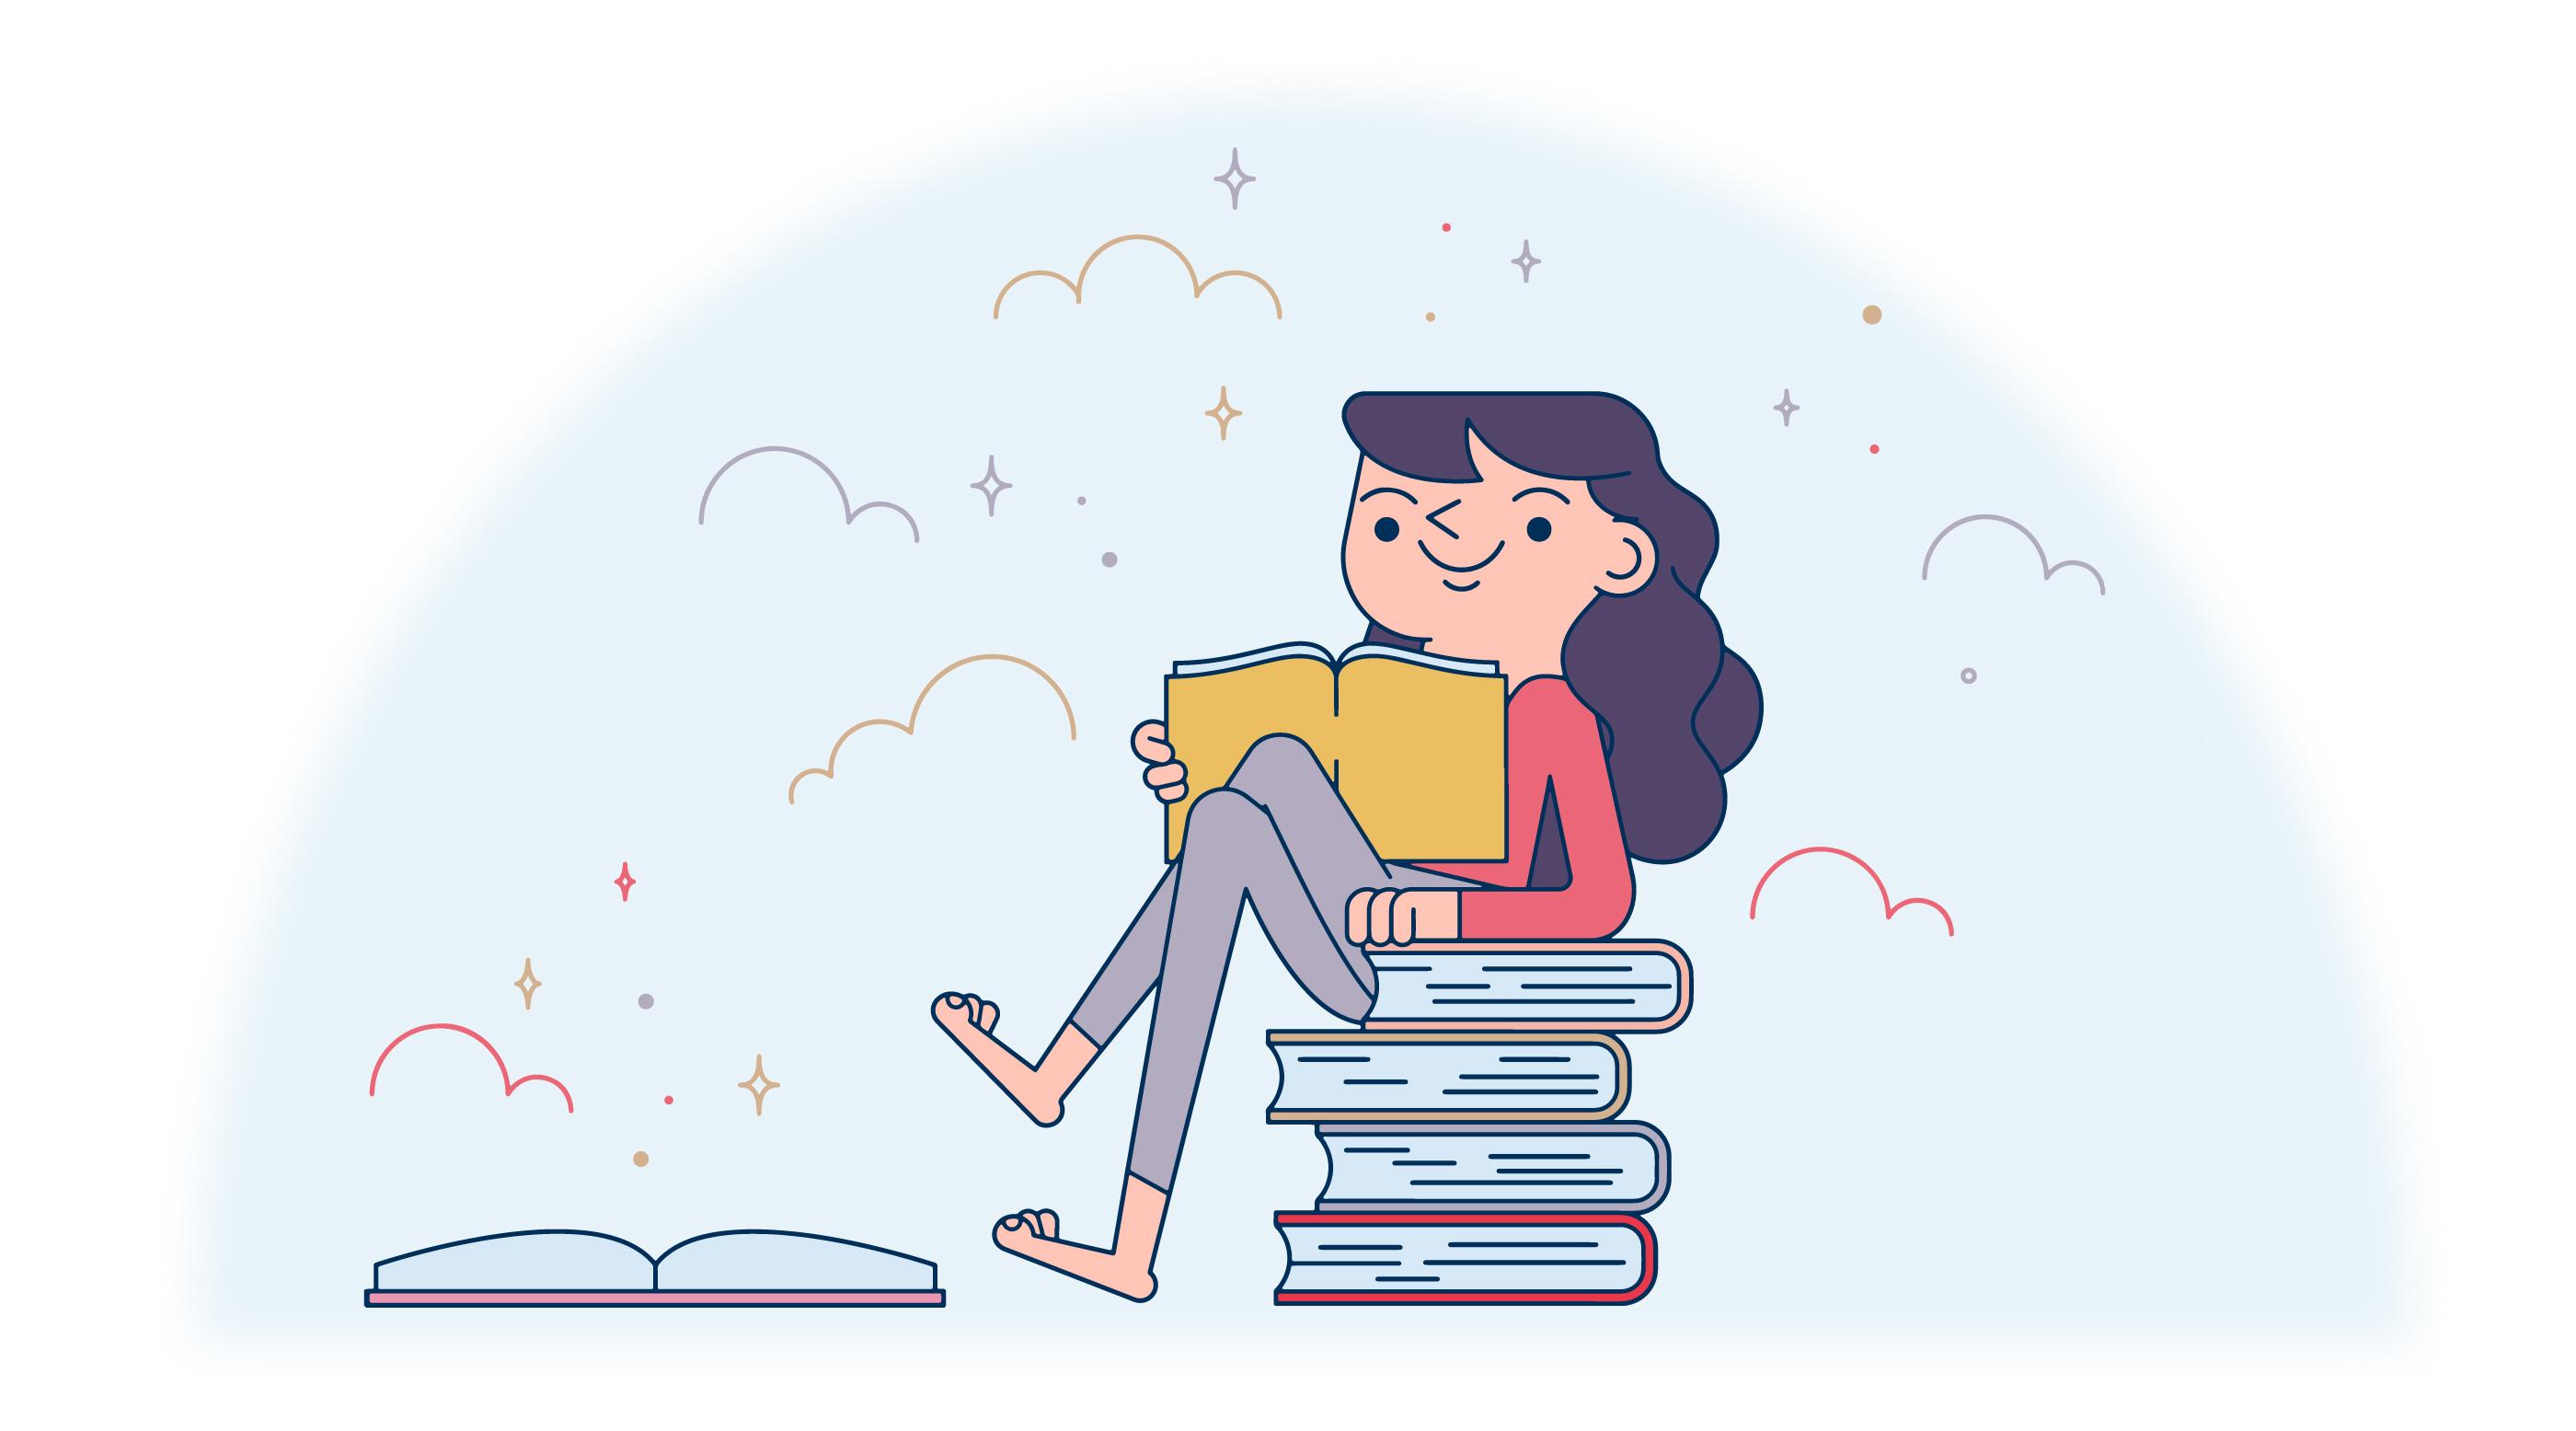 Download Books Lover Vector - Download Free Vectors, Clipart ...